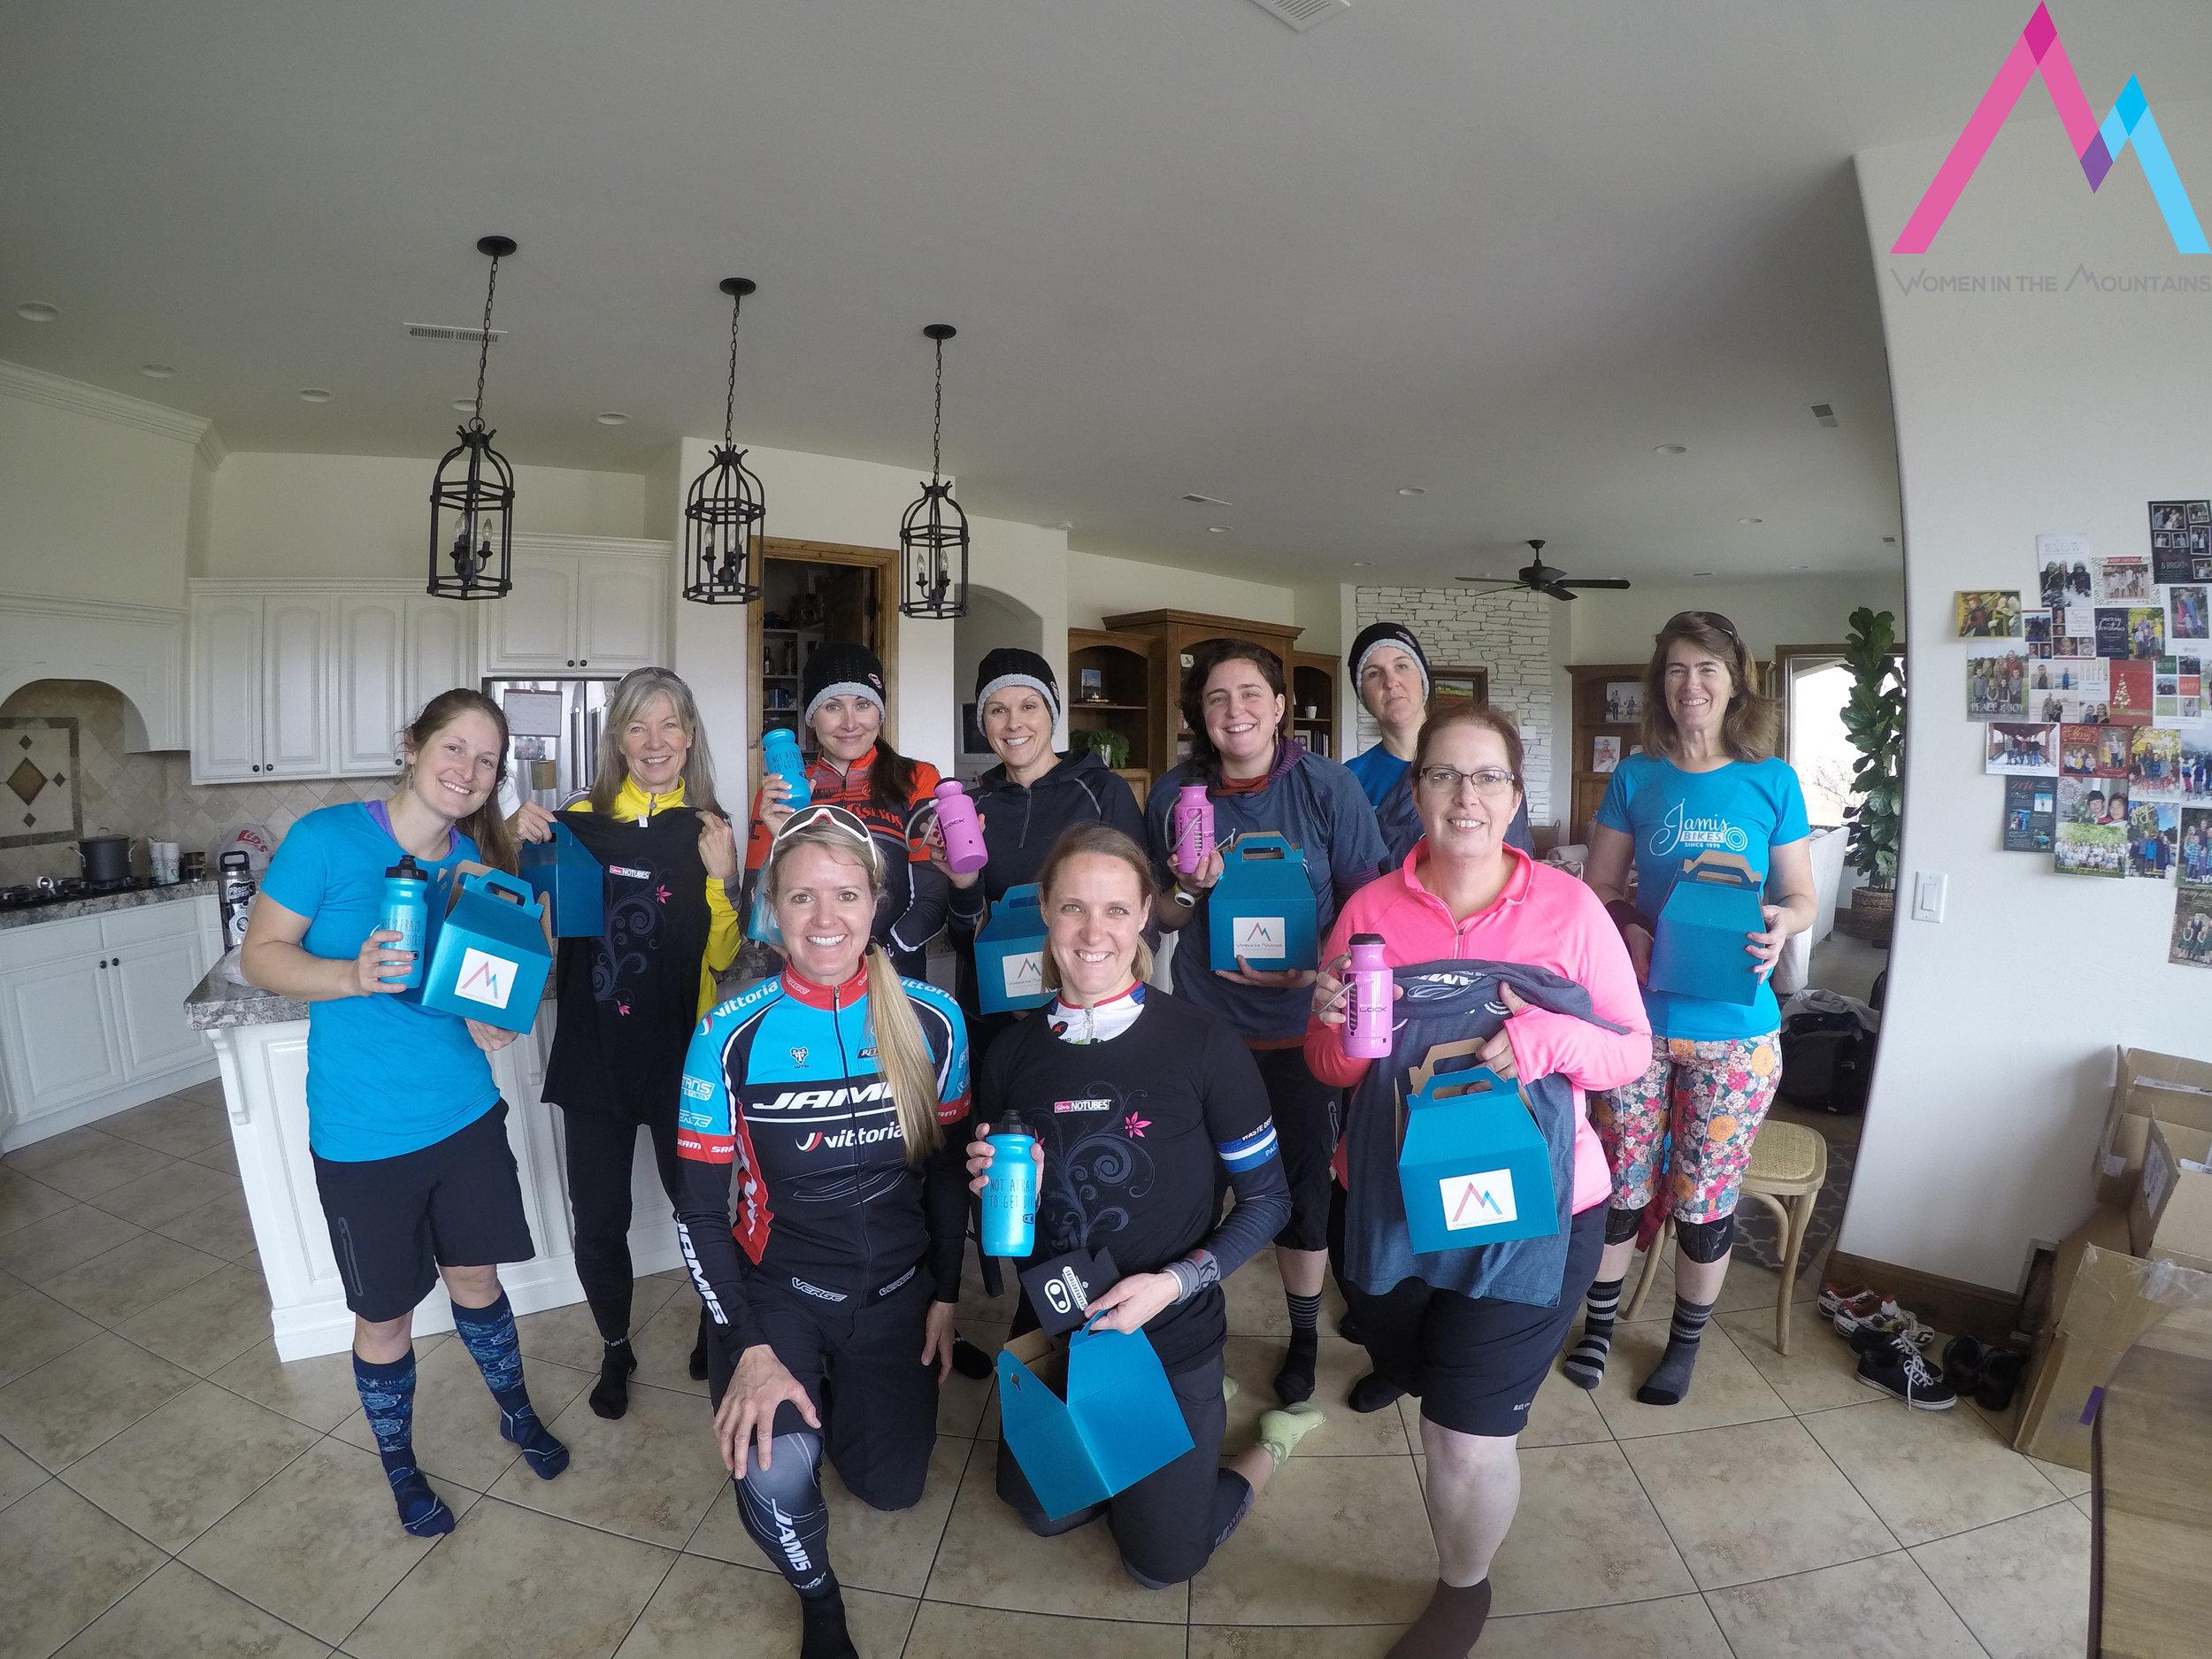 Katie, Kai, Natasha, Karen, Lindsay, Kim, Rebecca  Erica, Jana, Pam  (not picture, Lisa and Lynda)